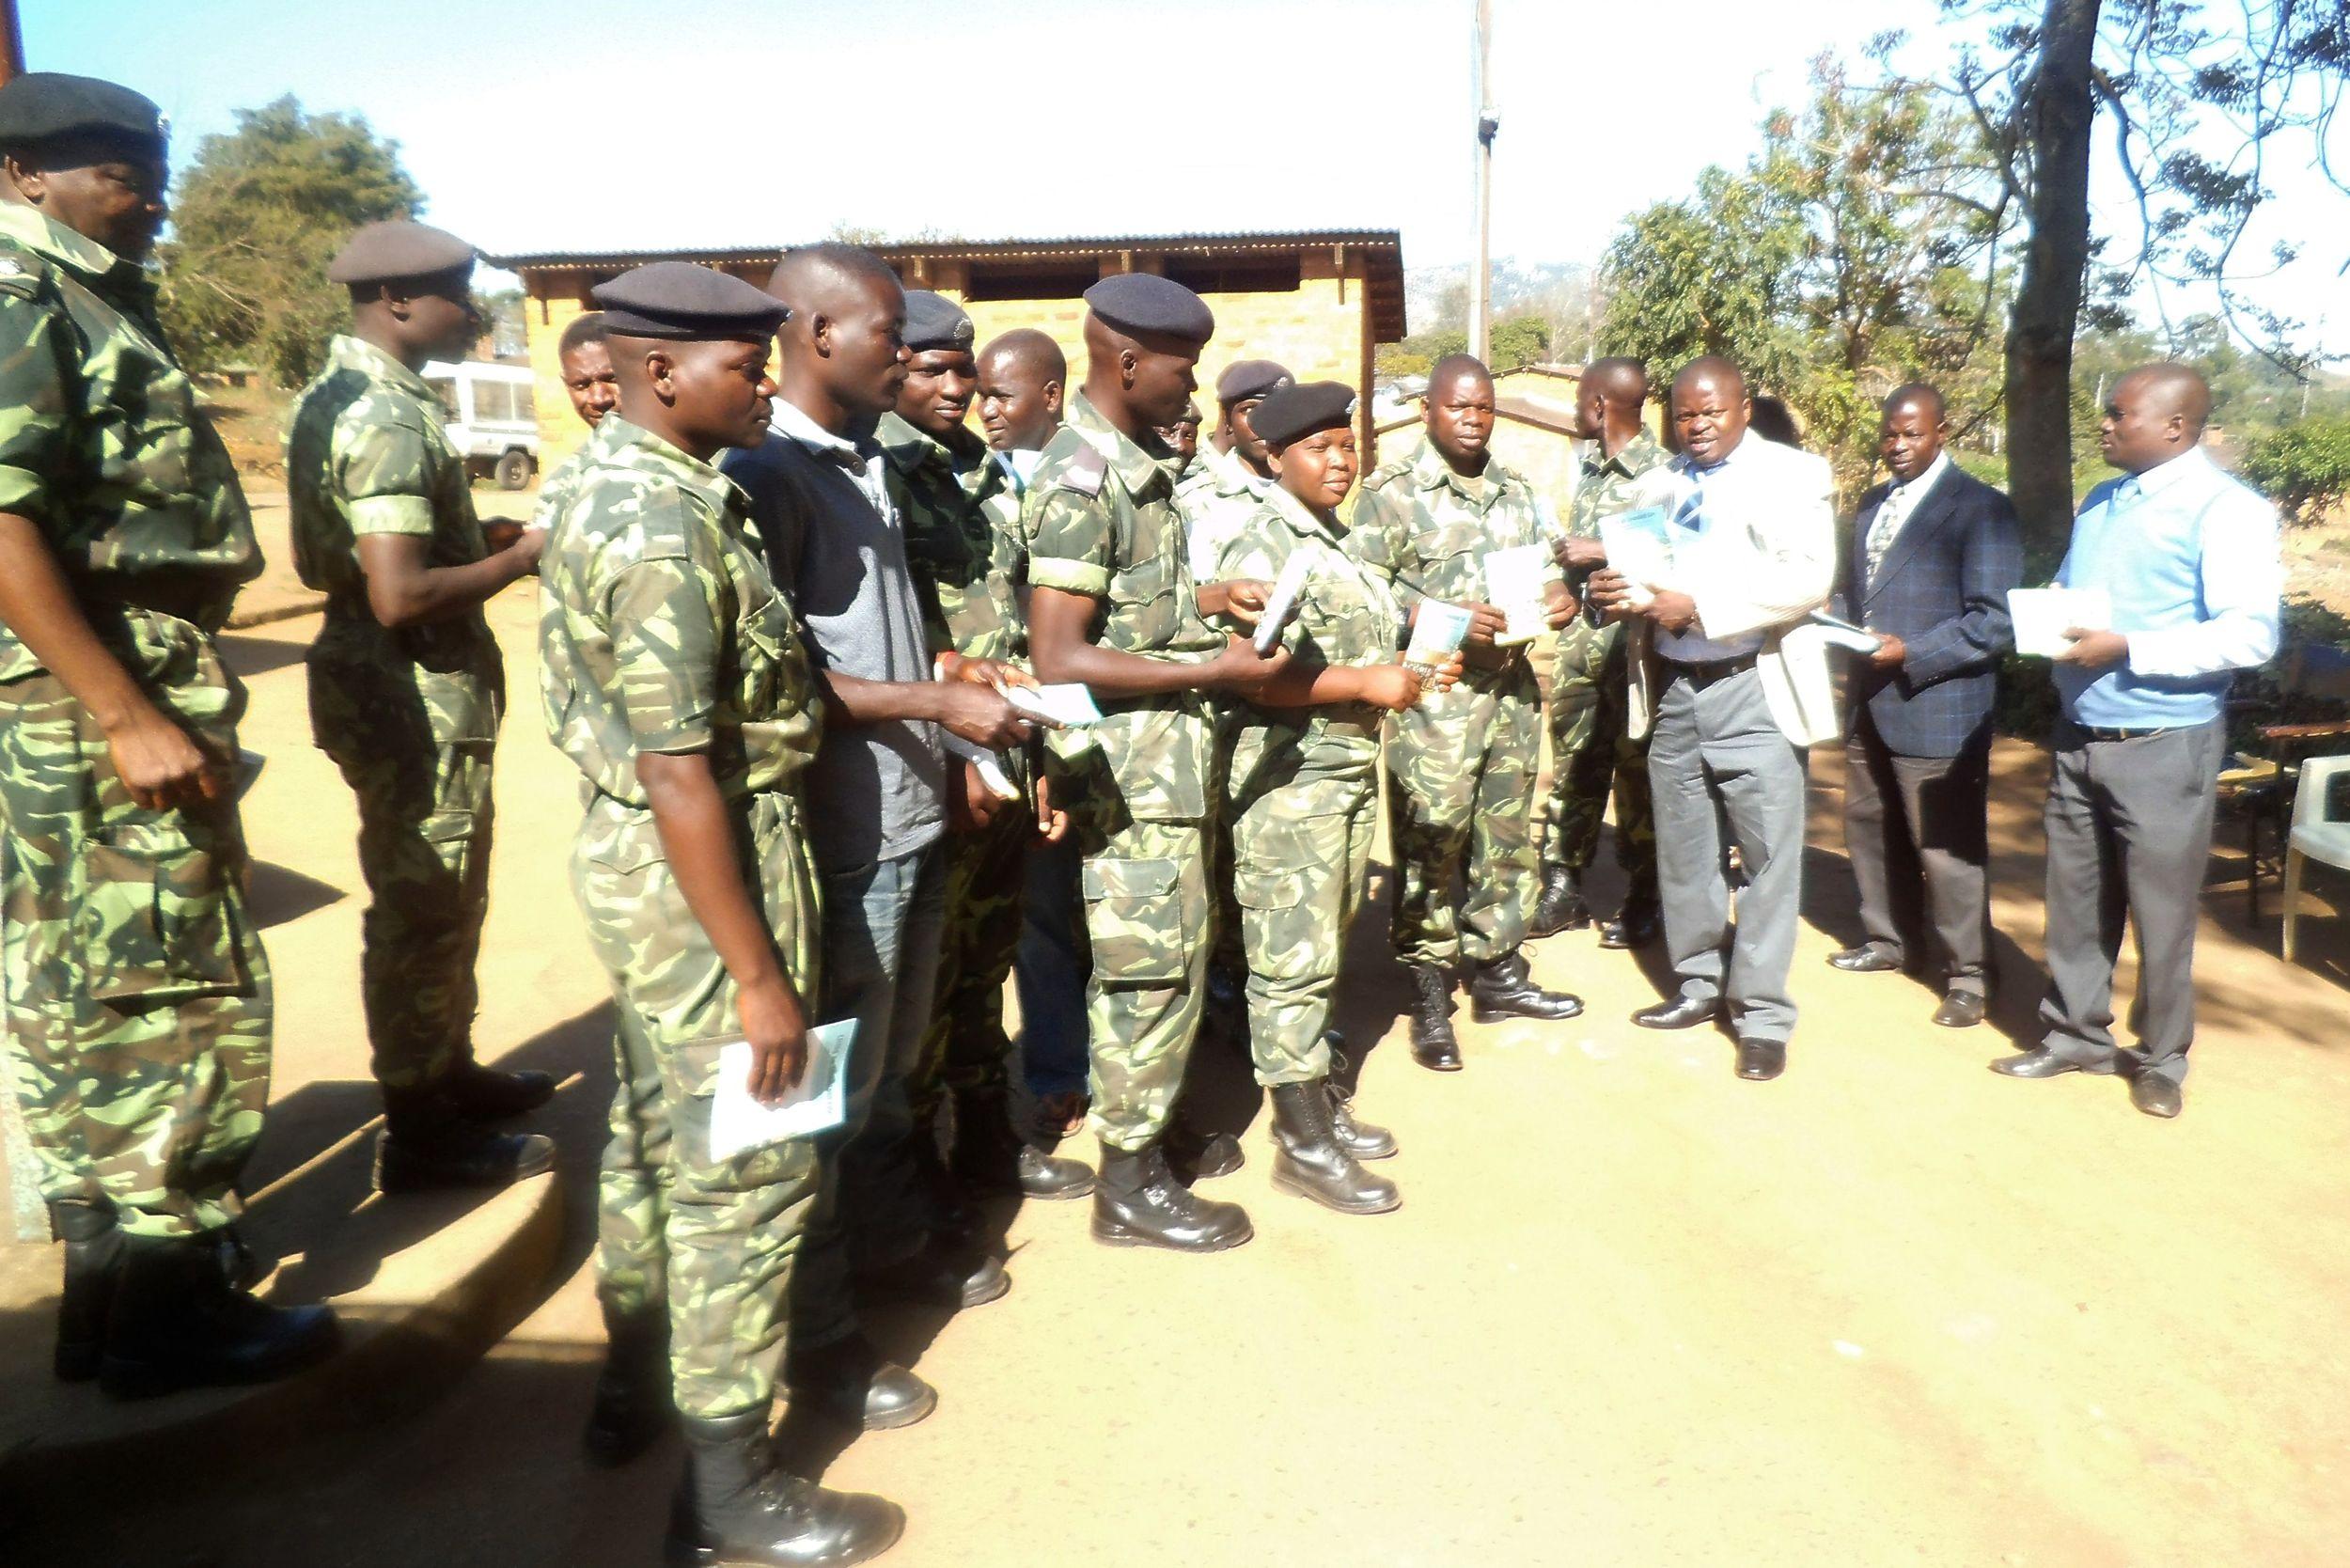 BIBLE STUDY DISTRIBUTION IN ZOMBA ARMY BARRACKS - 2014.jpg